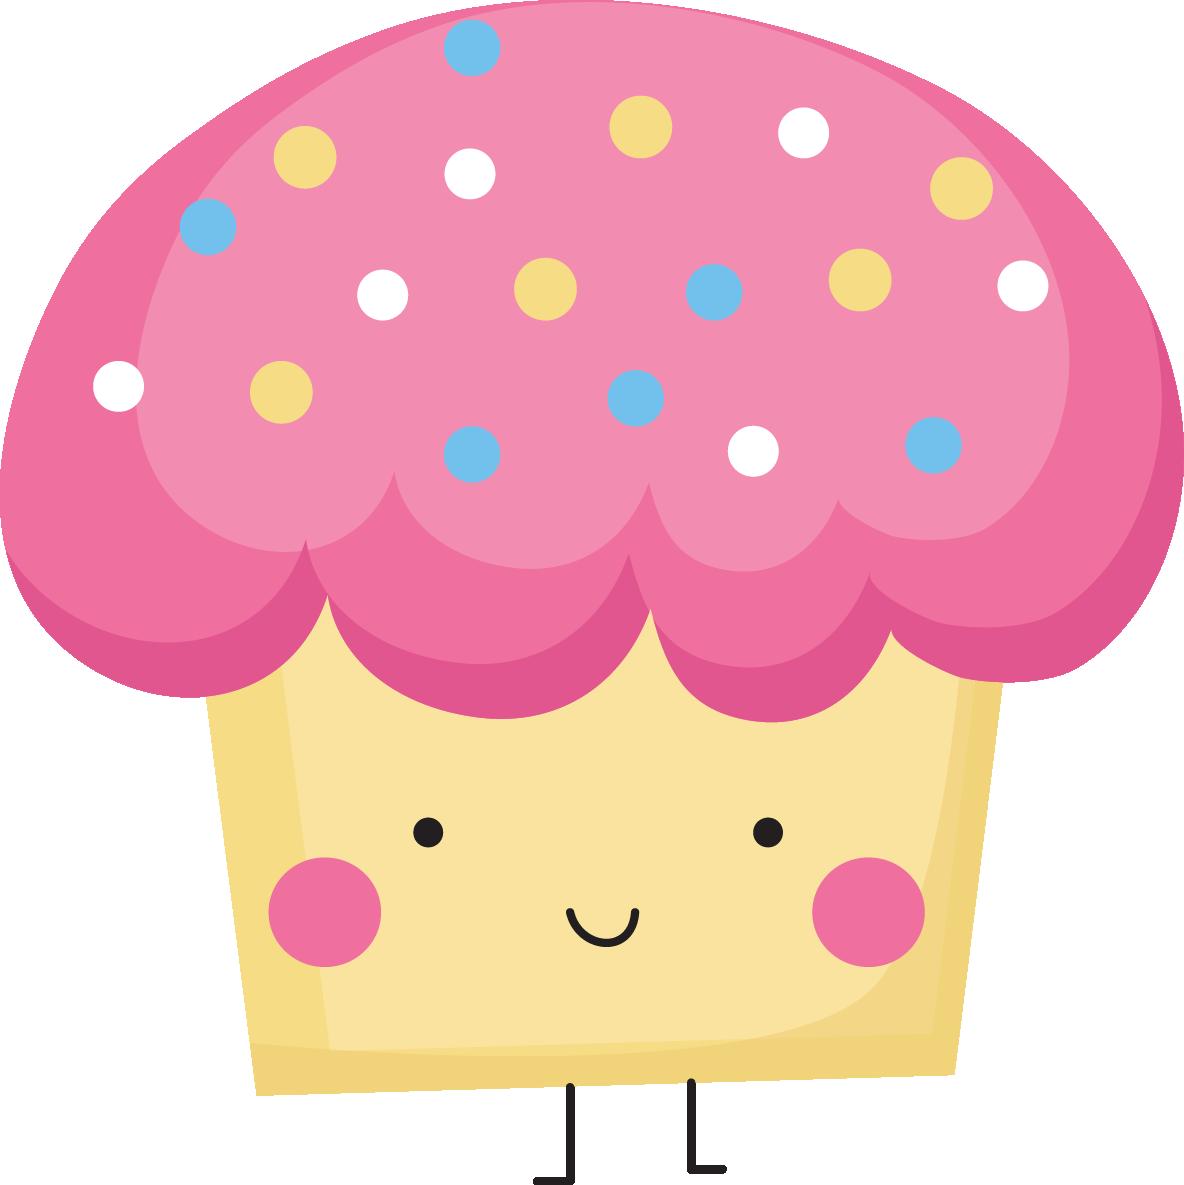 Cupcake Design Png : Cupcake Border - ClipArt Best